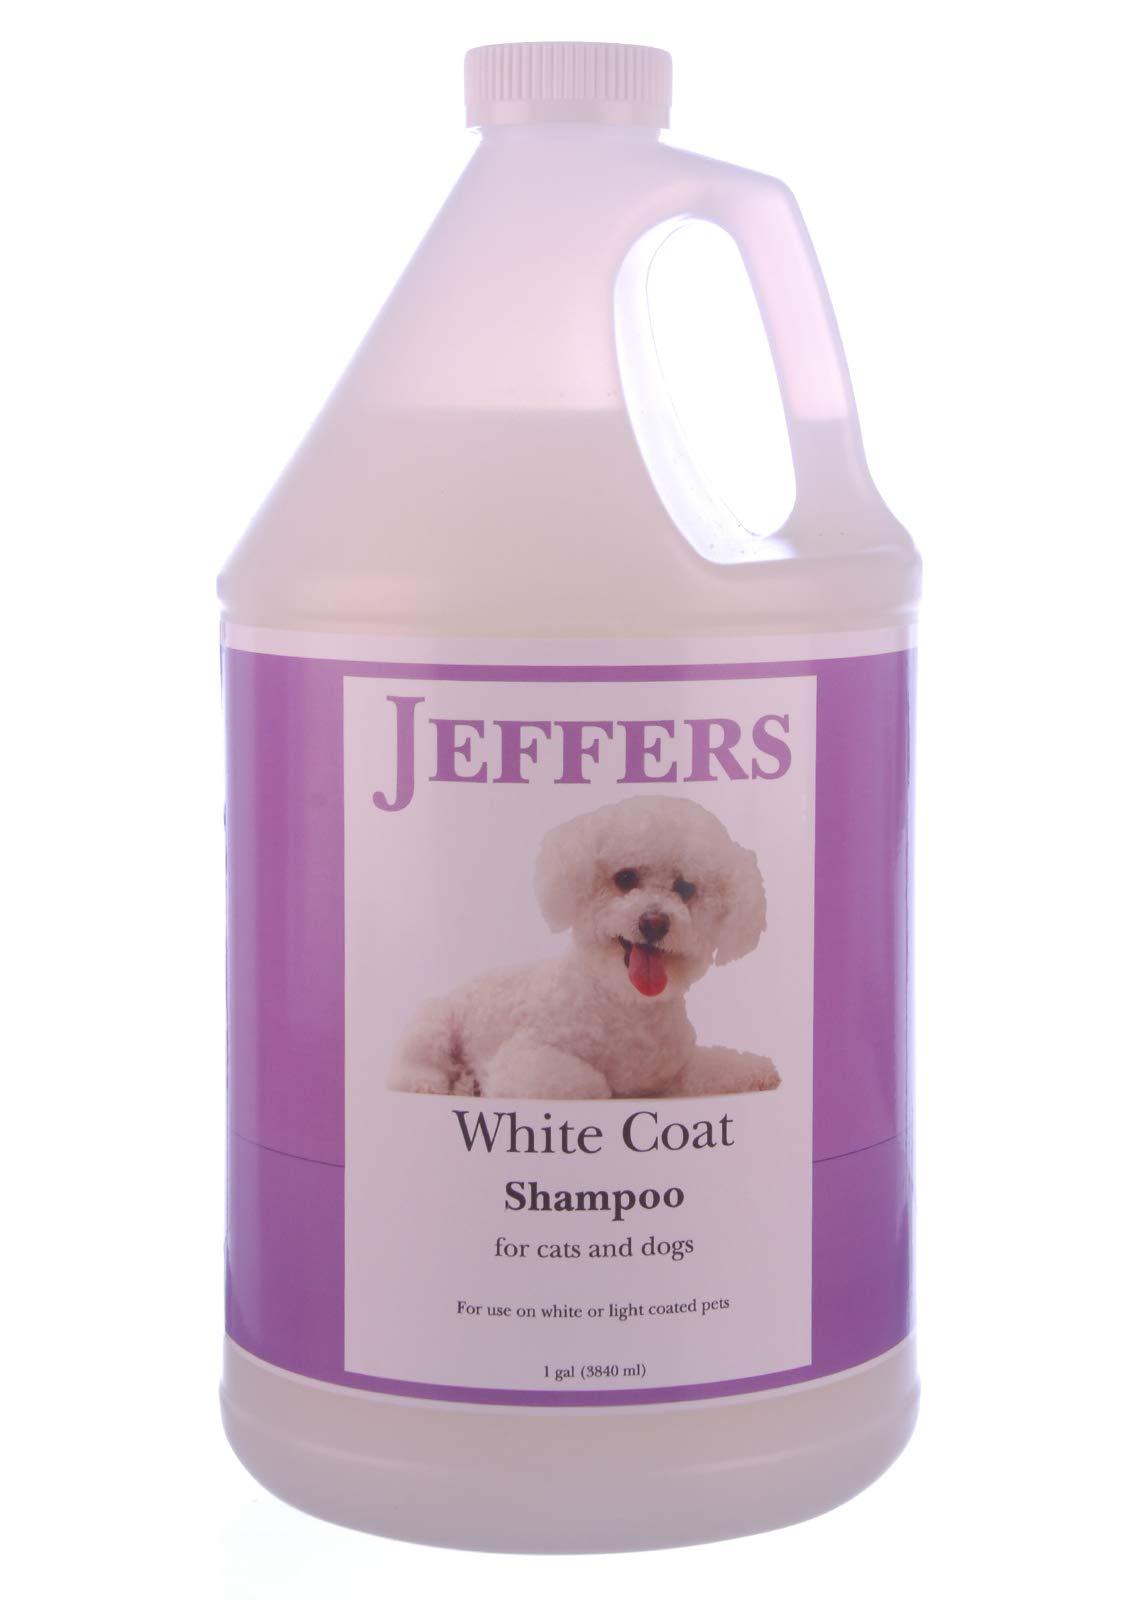 Jeffers White Coat Shampoo, Gallon by Jeffers